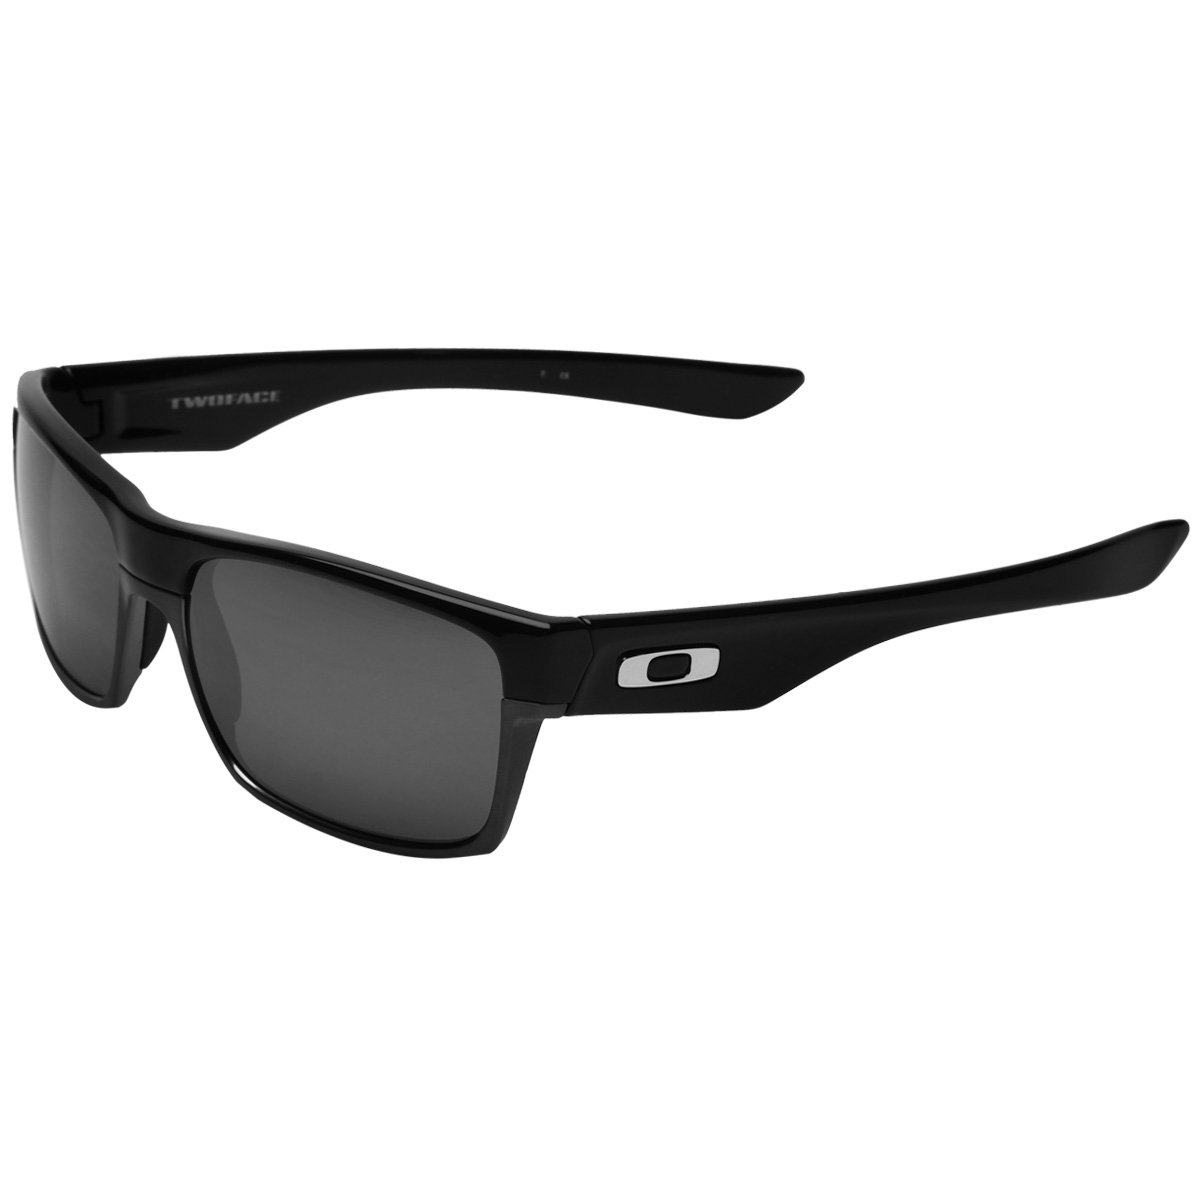 50d234761b98b Óculos Oakley Twoface - Iridium - Compre Agora